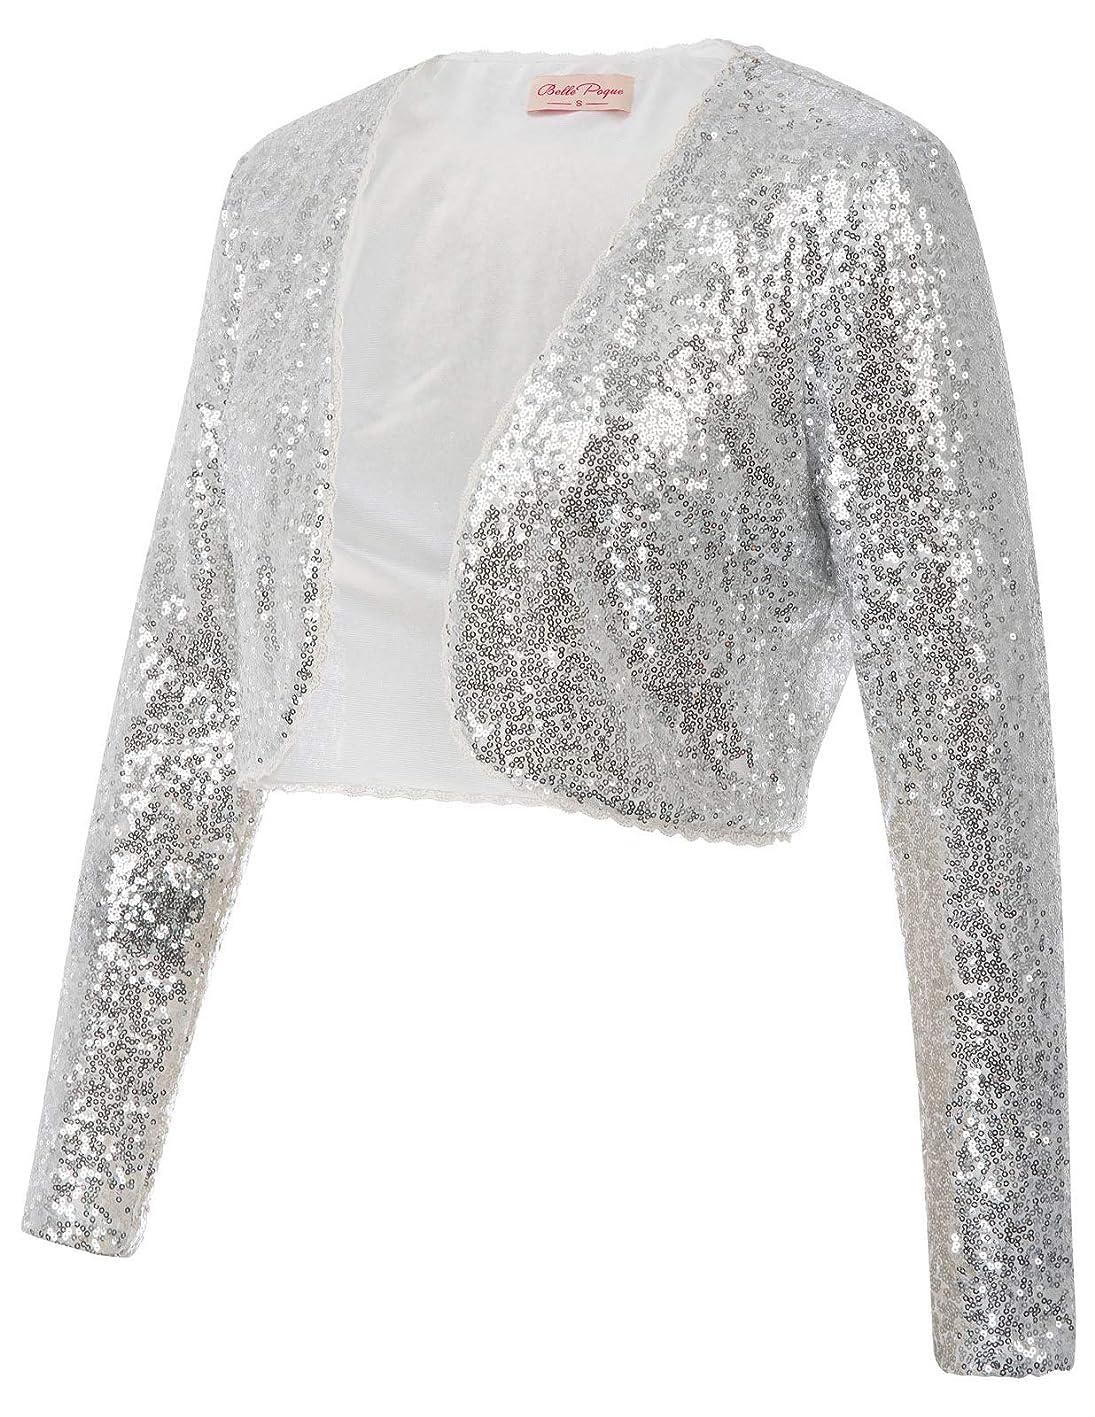 Womens Sequin Jacket Open Front Glitter Cropped Bolero Shrug zeqgyrswduw097